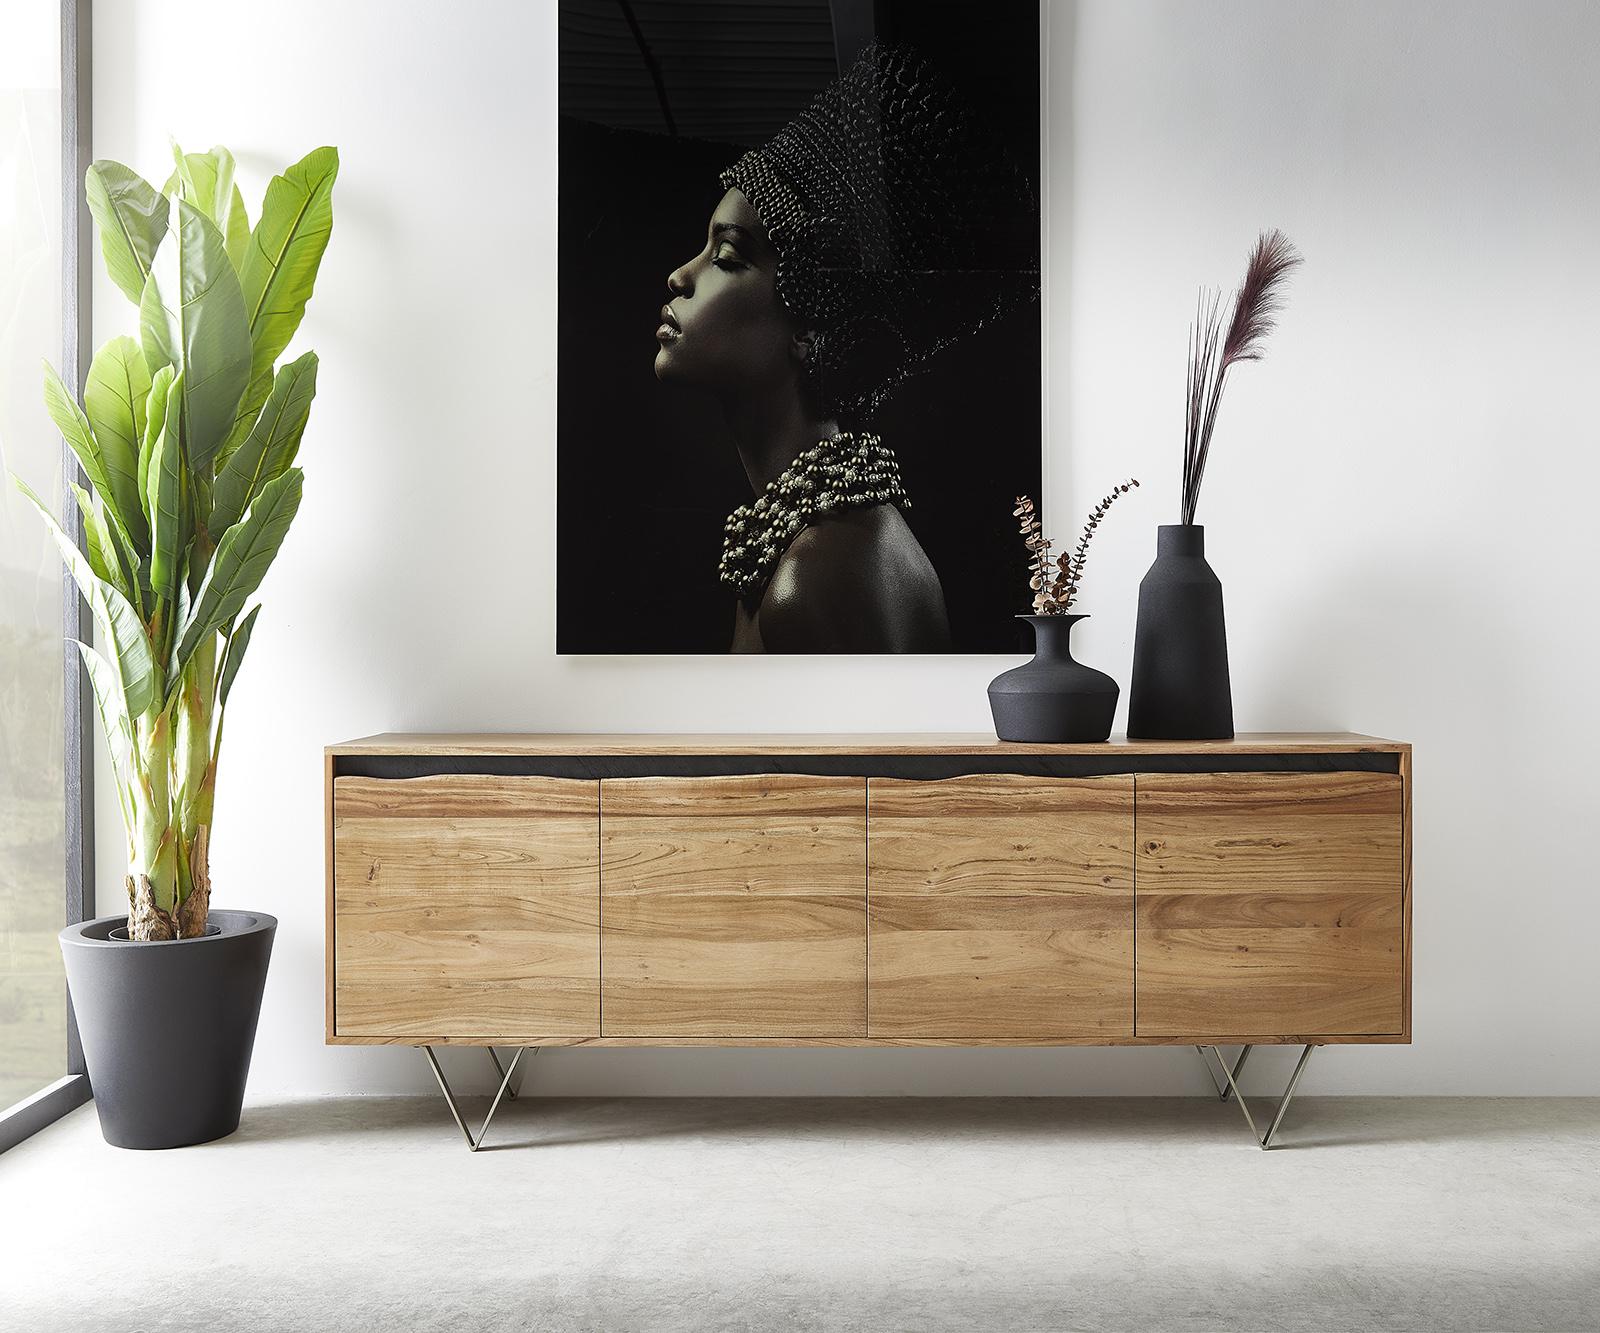 Sideboard Stonegrace 200x45 cm Akazie Natur 4 Türen Baumkante